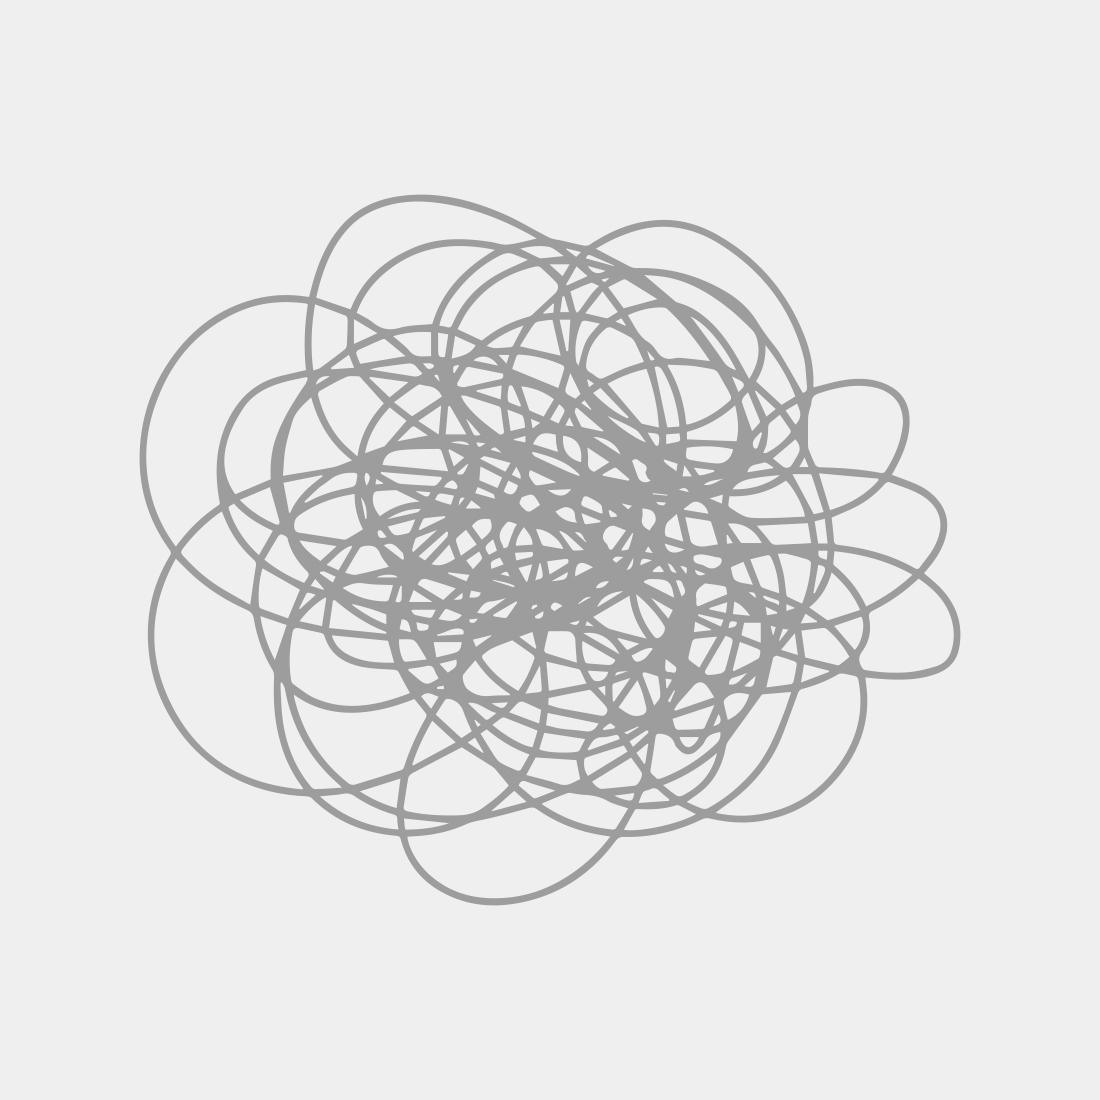 Evening Star By Gillian Ayres